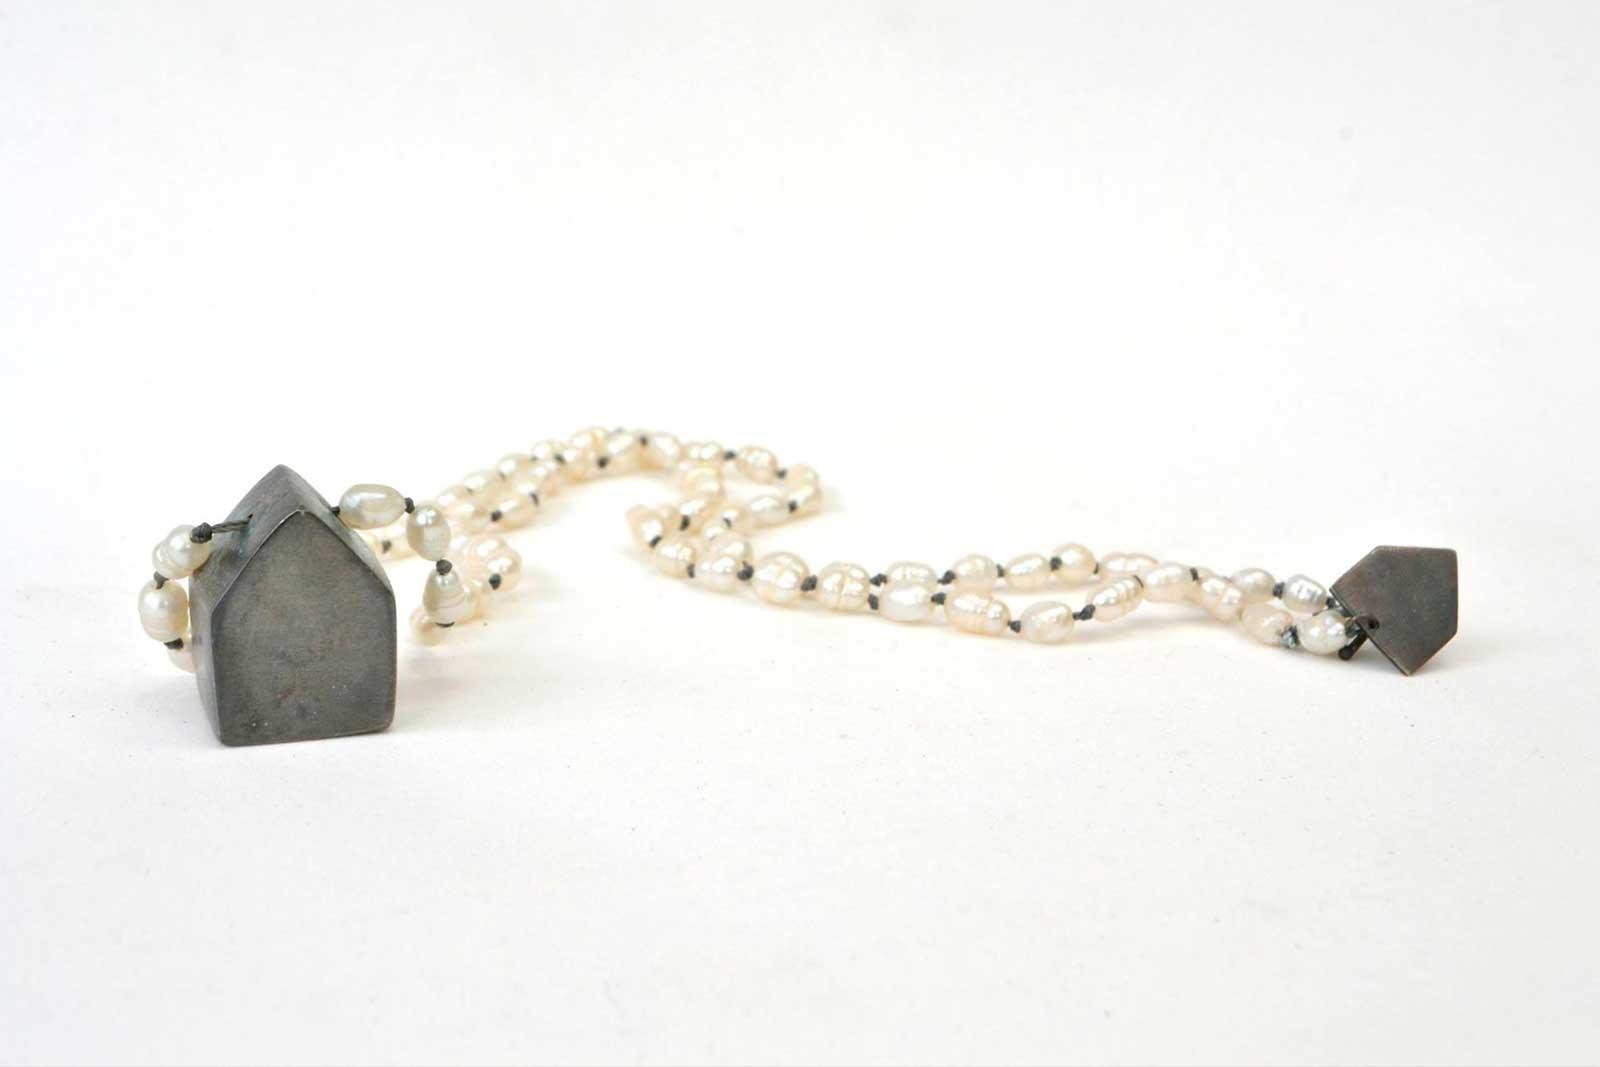 bruselas-joyeria-contemporanea-tienda-collar-casa-plata-oxidada-perlas-rio-hilo-gris